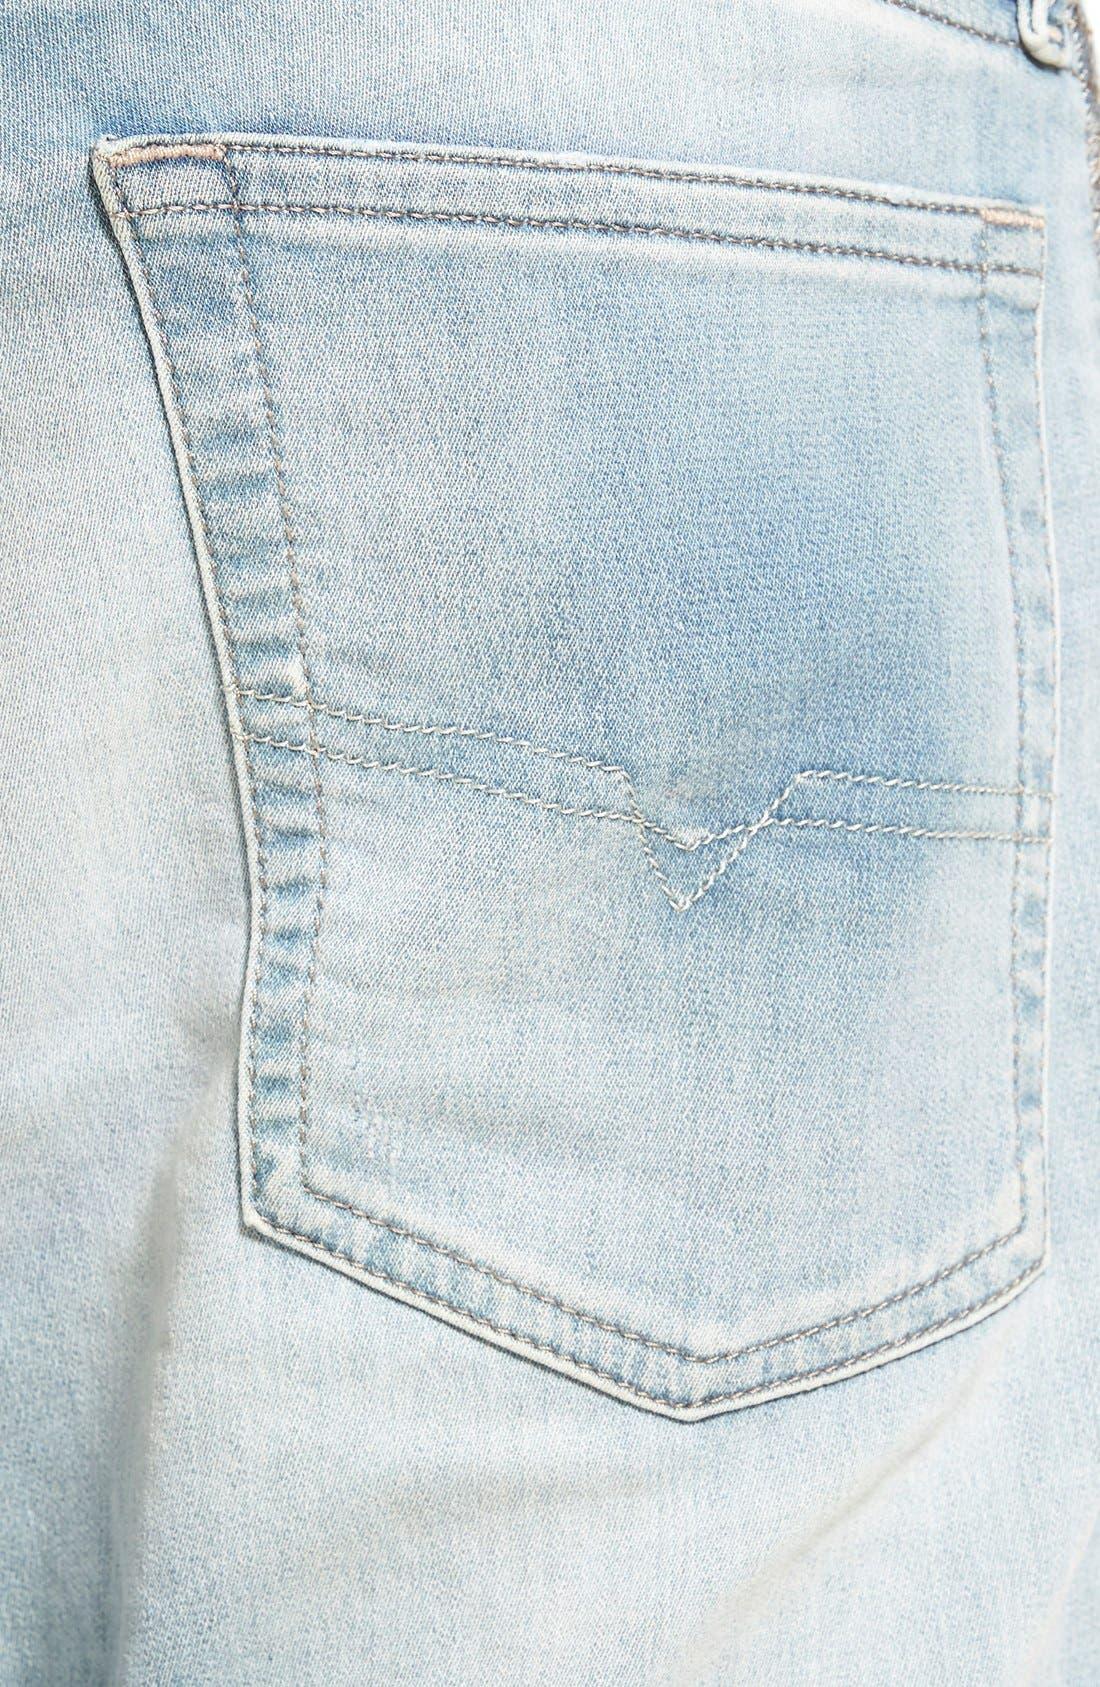 'Spender' Skinny Fit Jeans,                             Alternate thumbnail 2, color,                             400